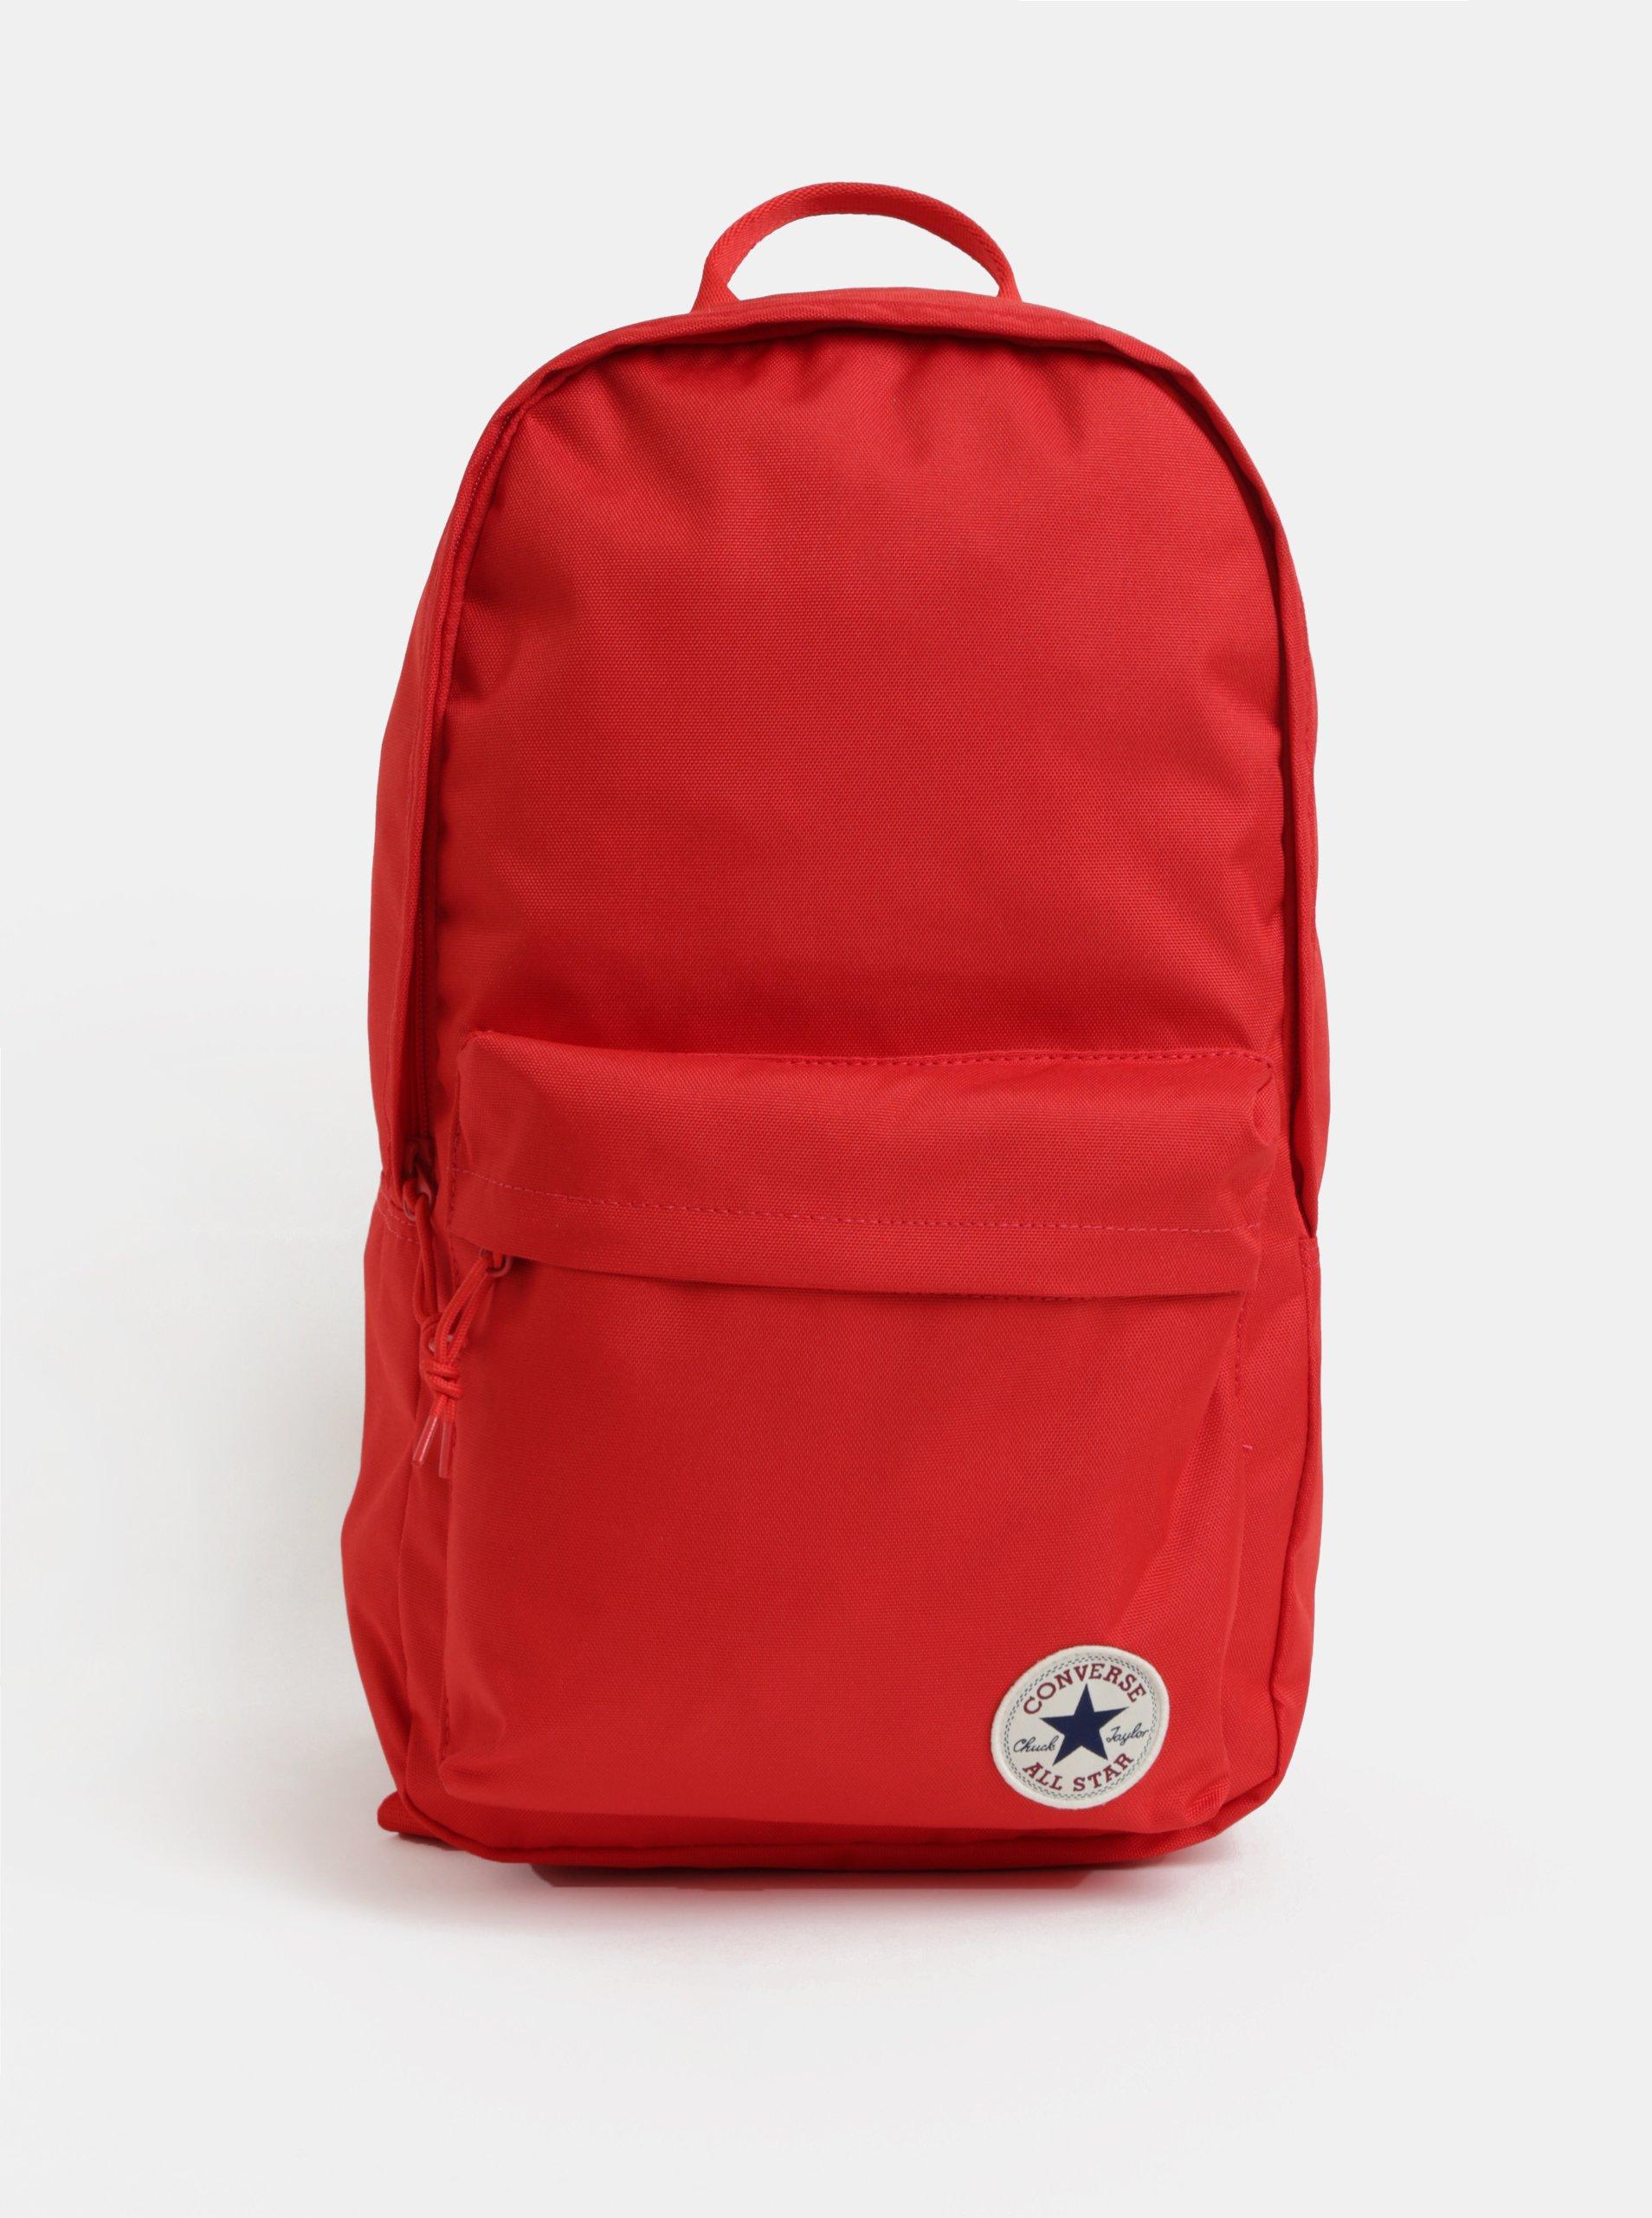 Červený batoh Converse EDC Backpack 19 l  f7698863b8